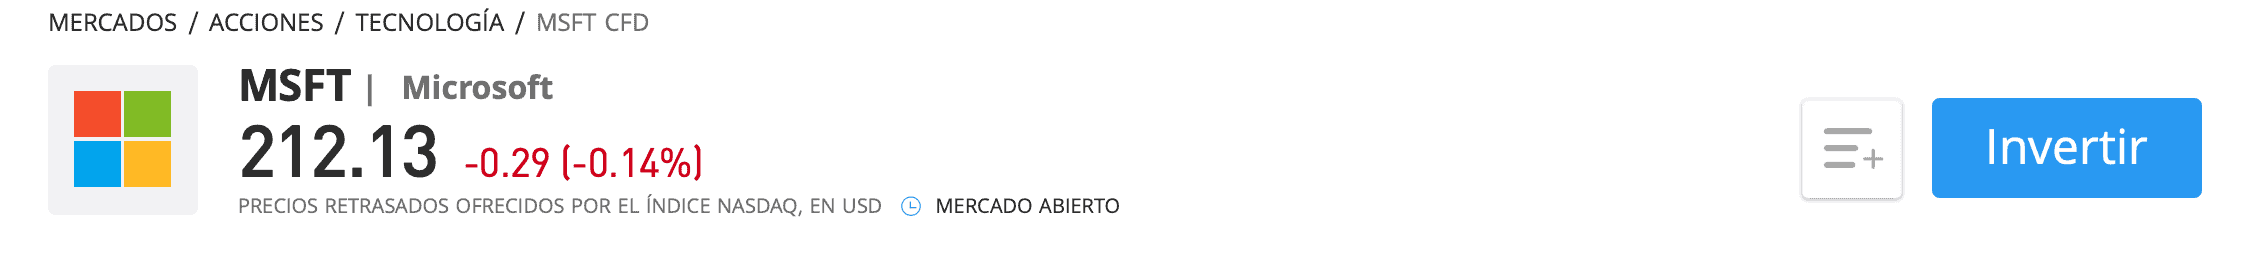 Comprar acciones Microsoft eToro